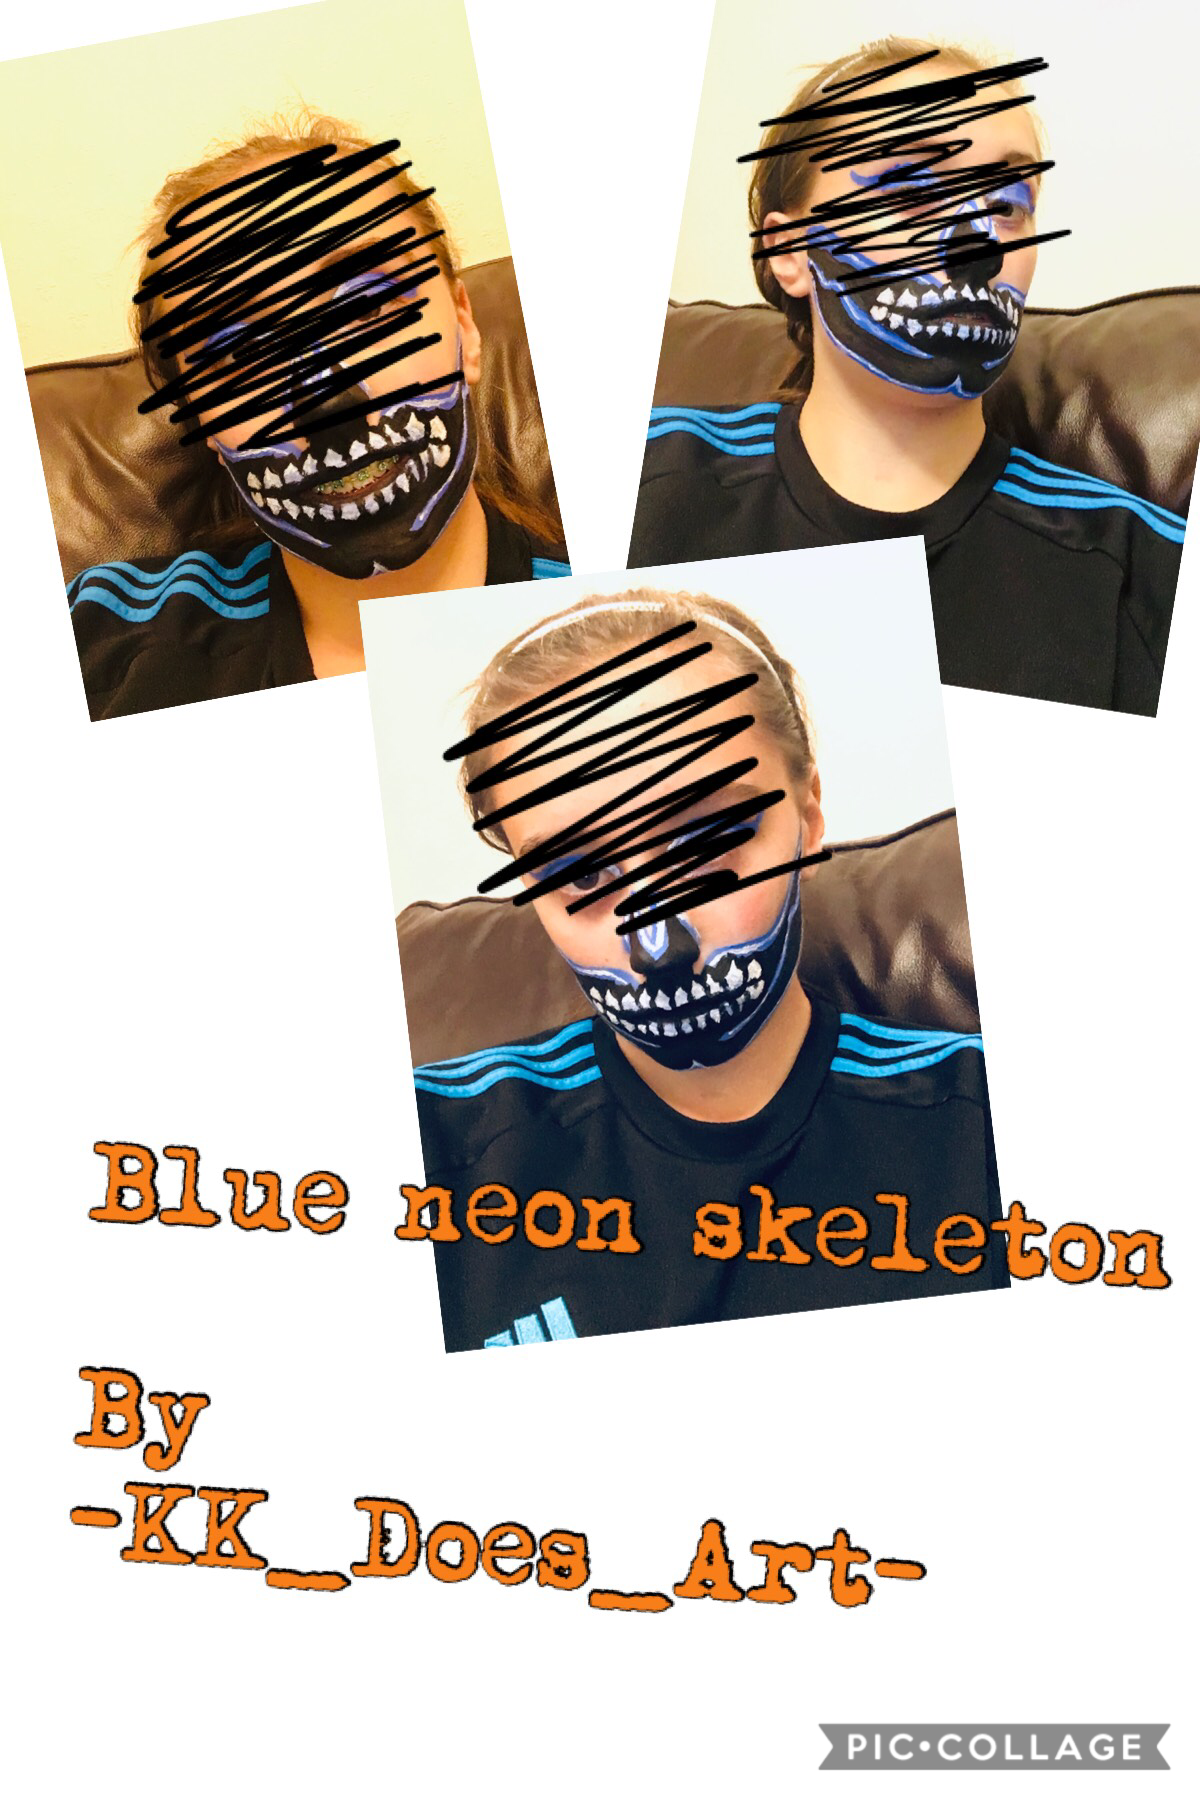 @-KK_Does_Art- @SoohieSefton